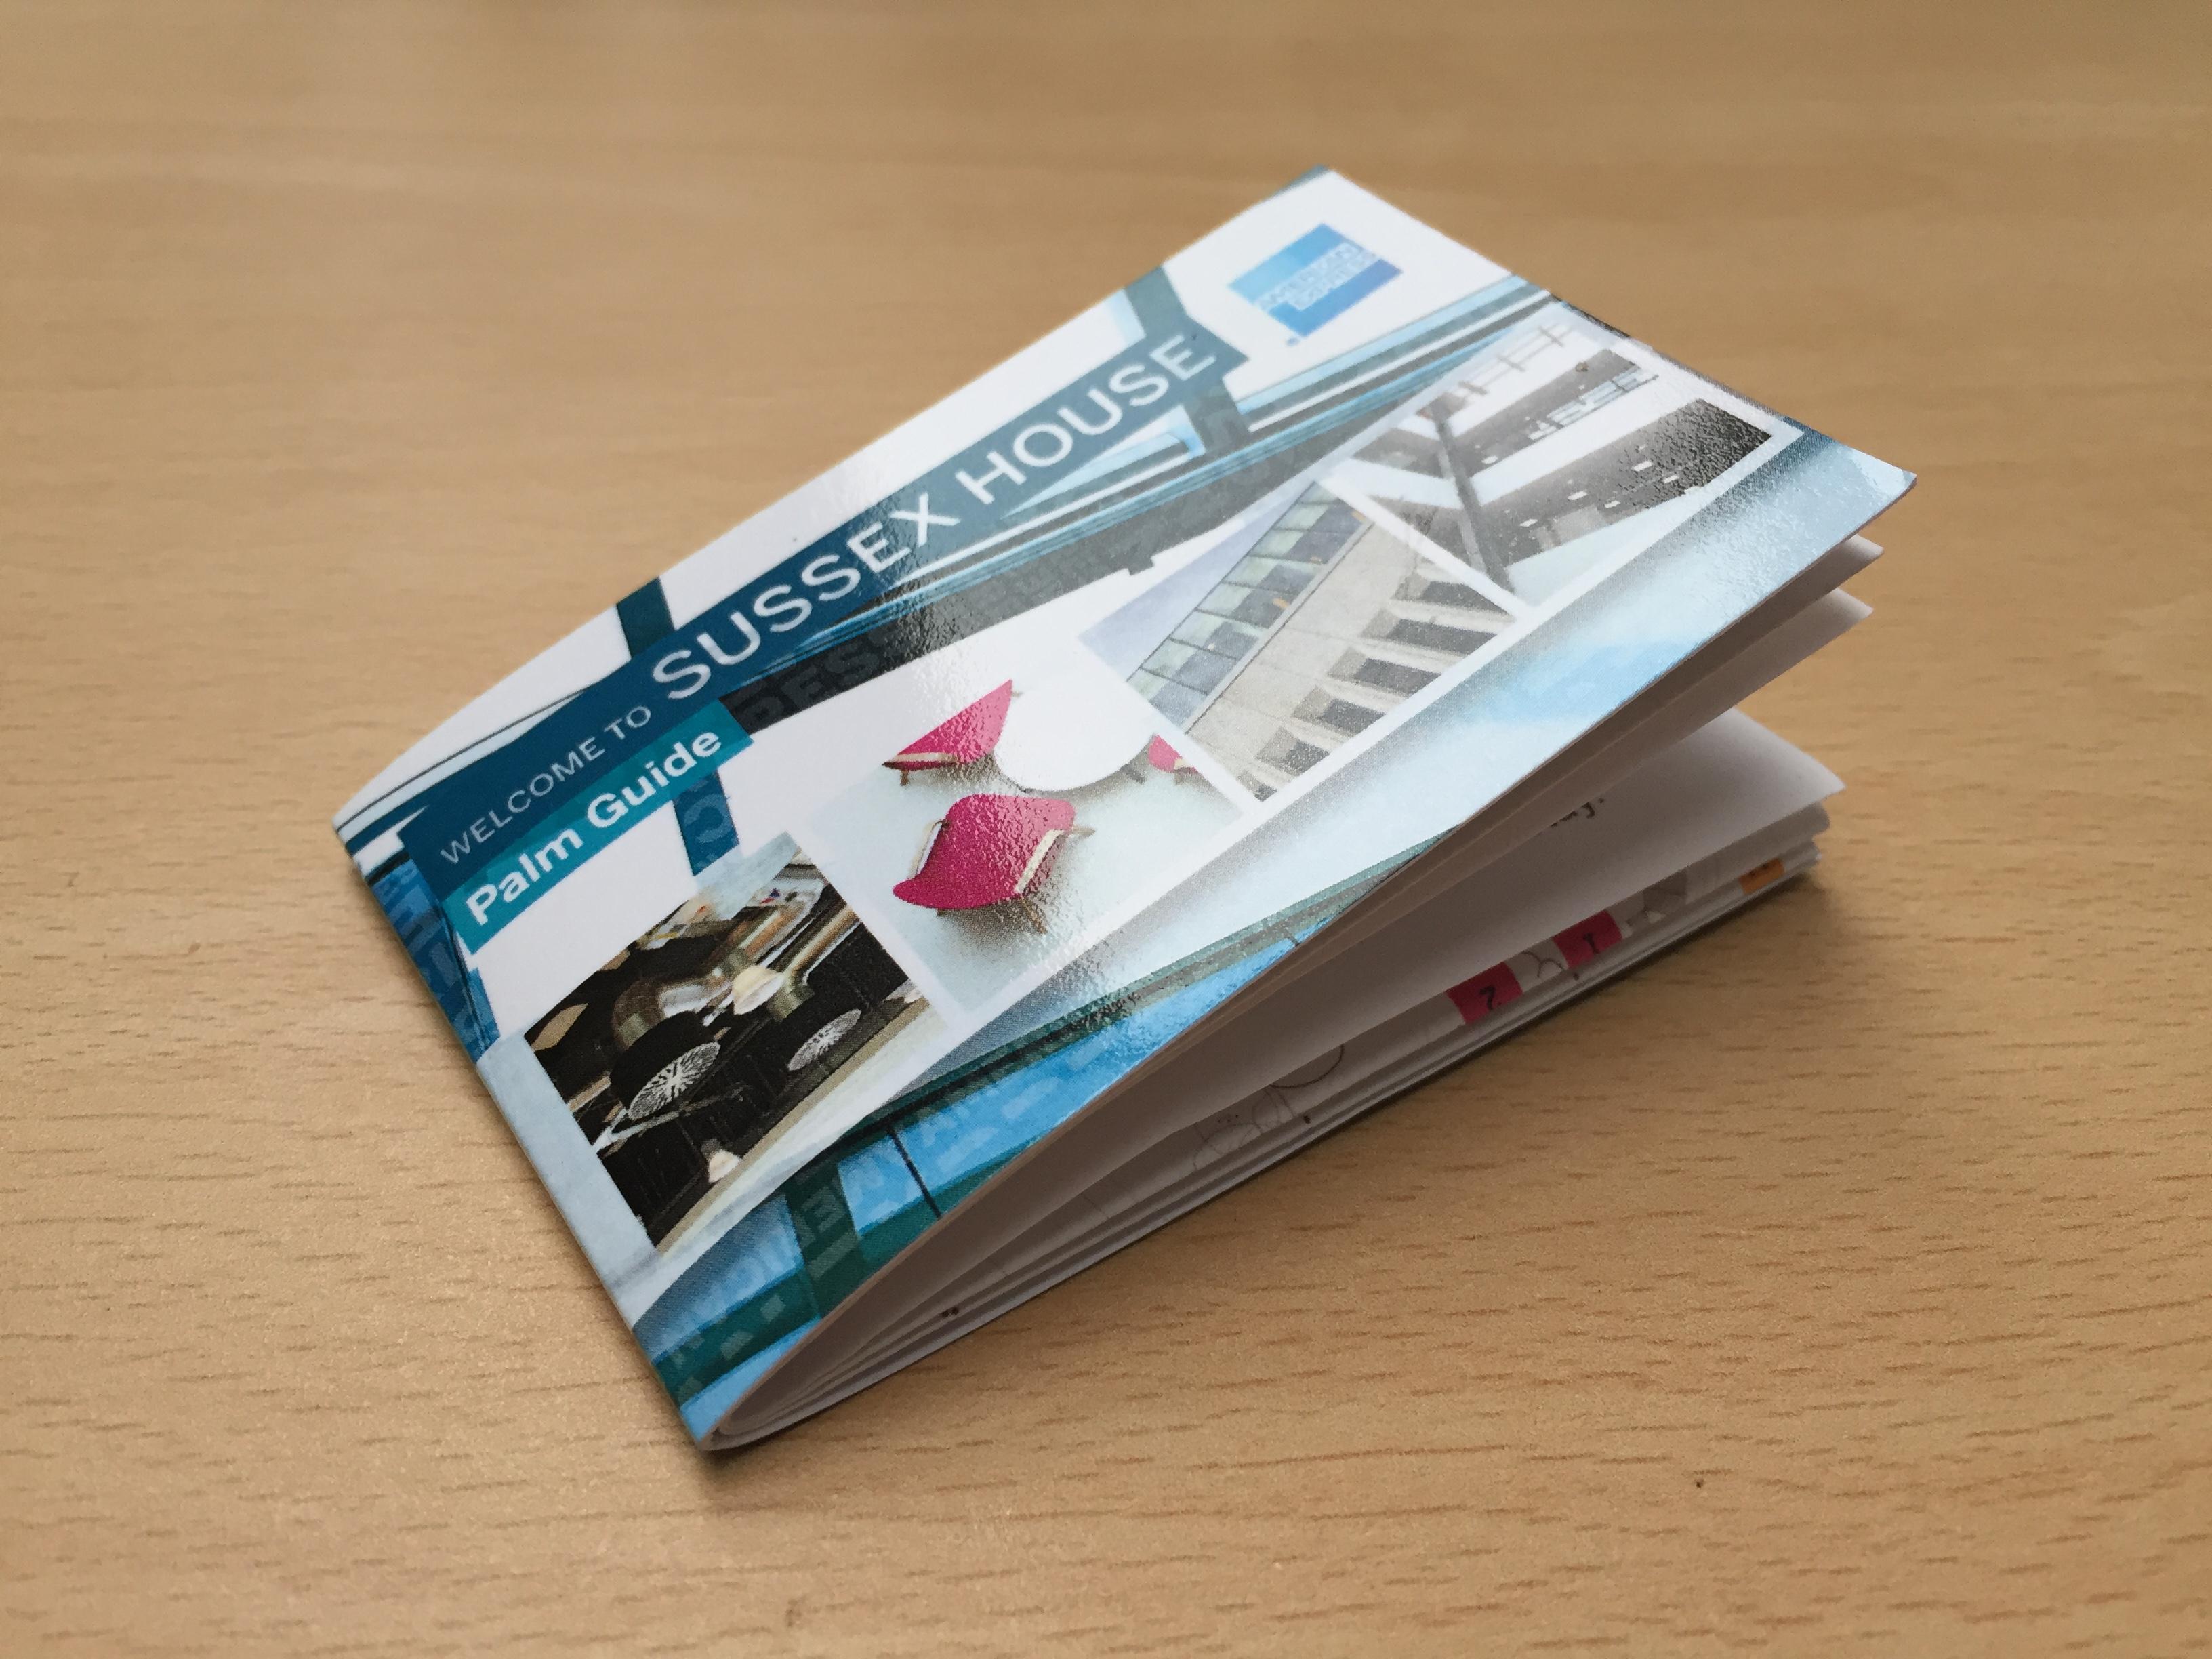 AMEX Printed Pocket Guide